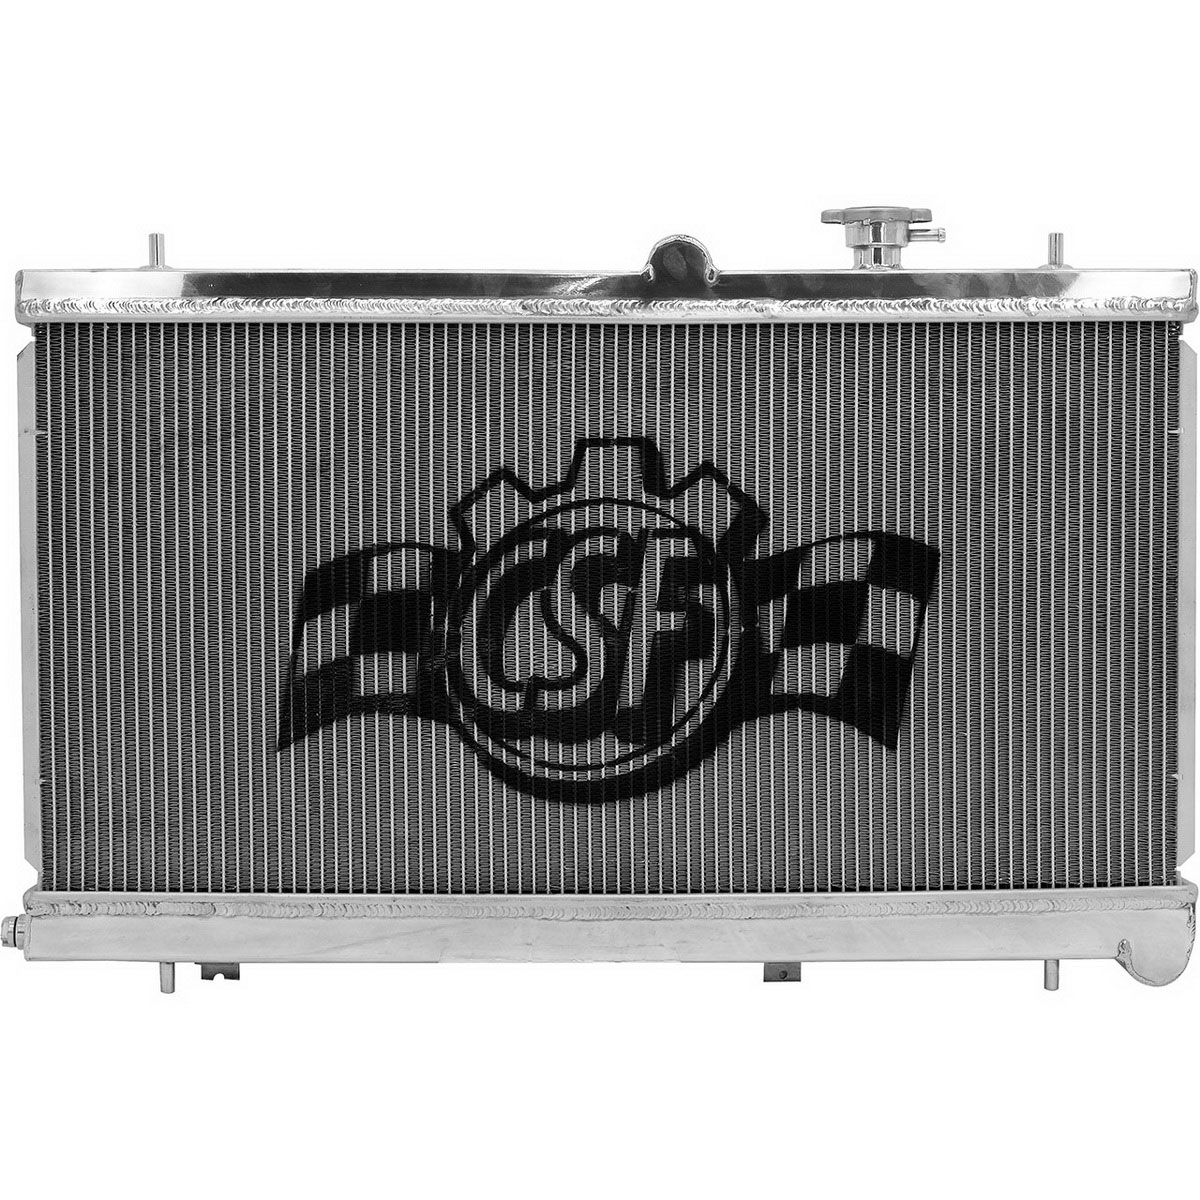 Csf Aluminum Radiator W Filler Neck 2002 2007 Wrx Amp Sti Mt